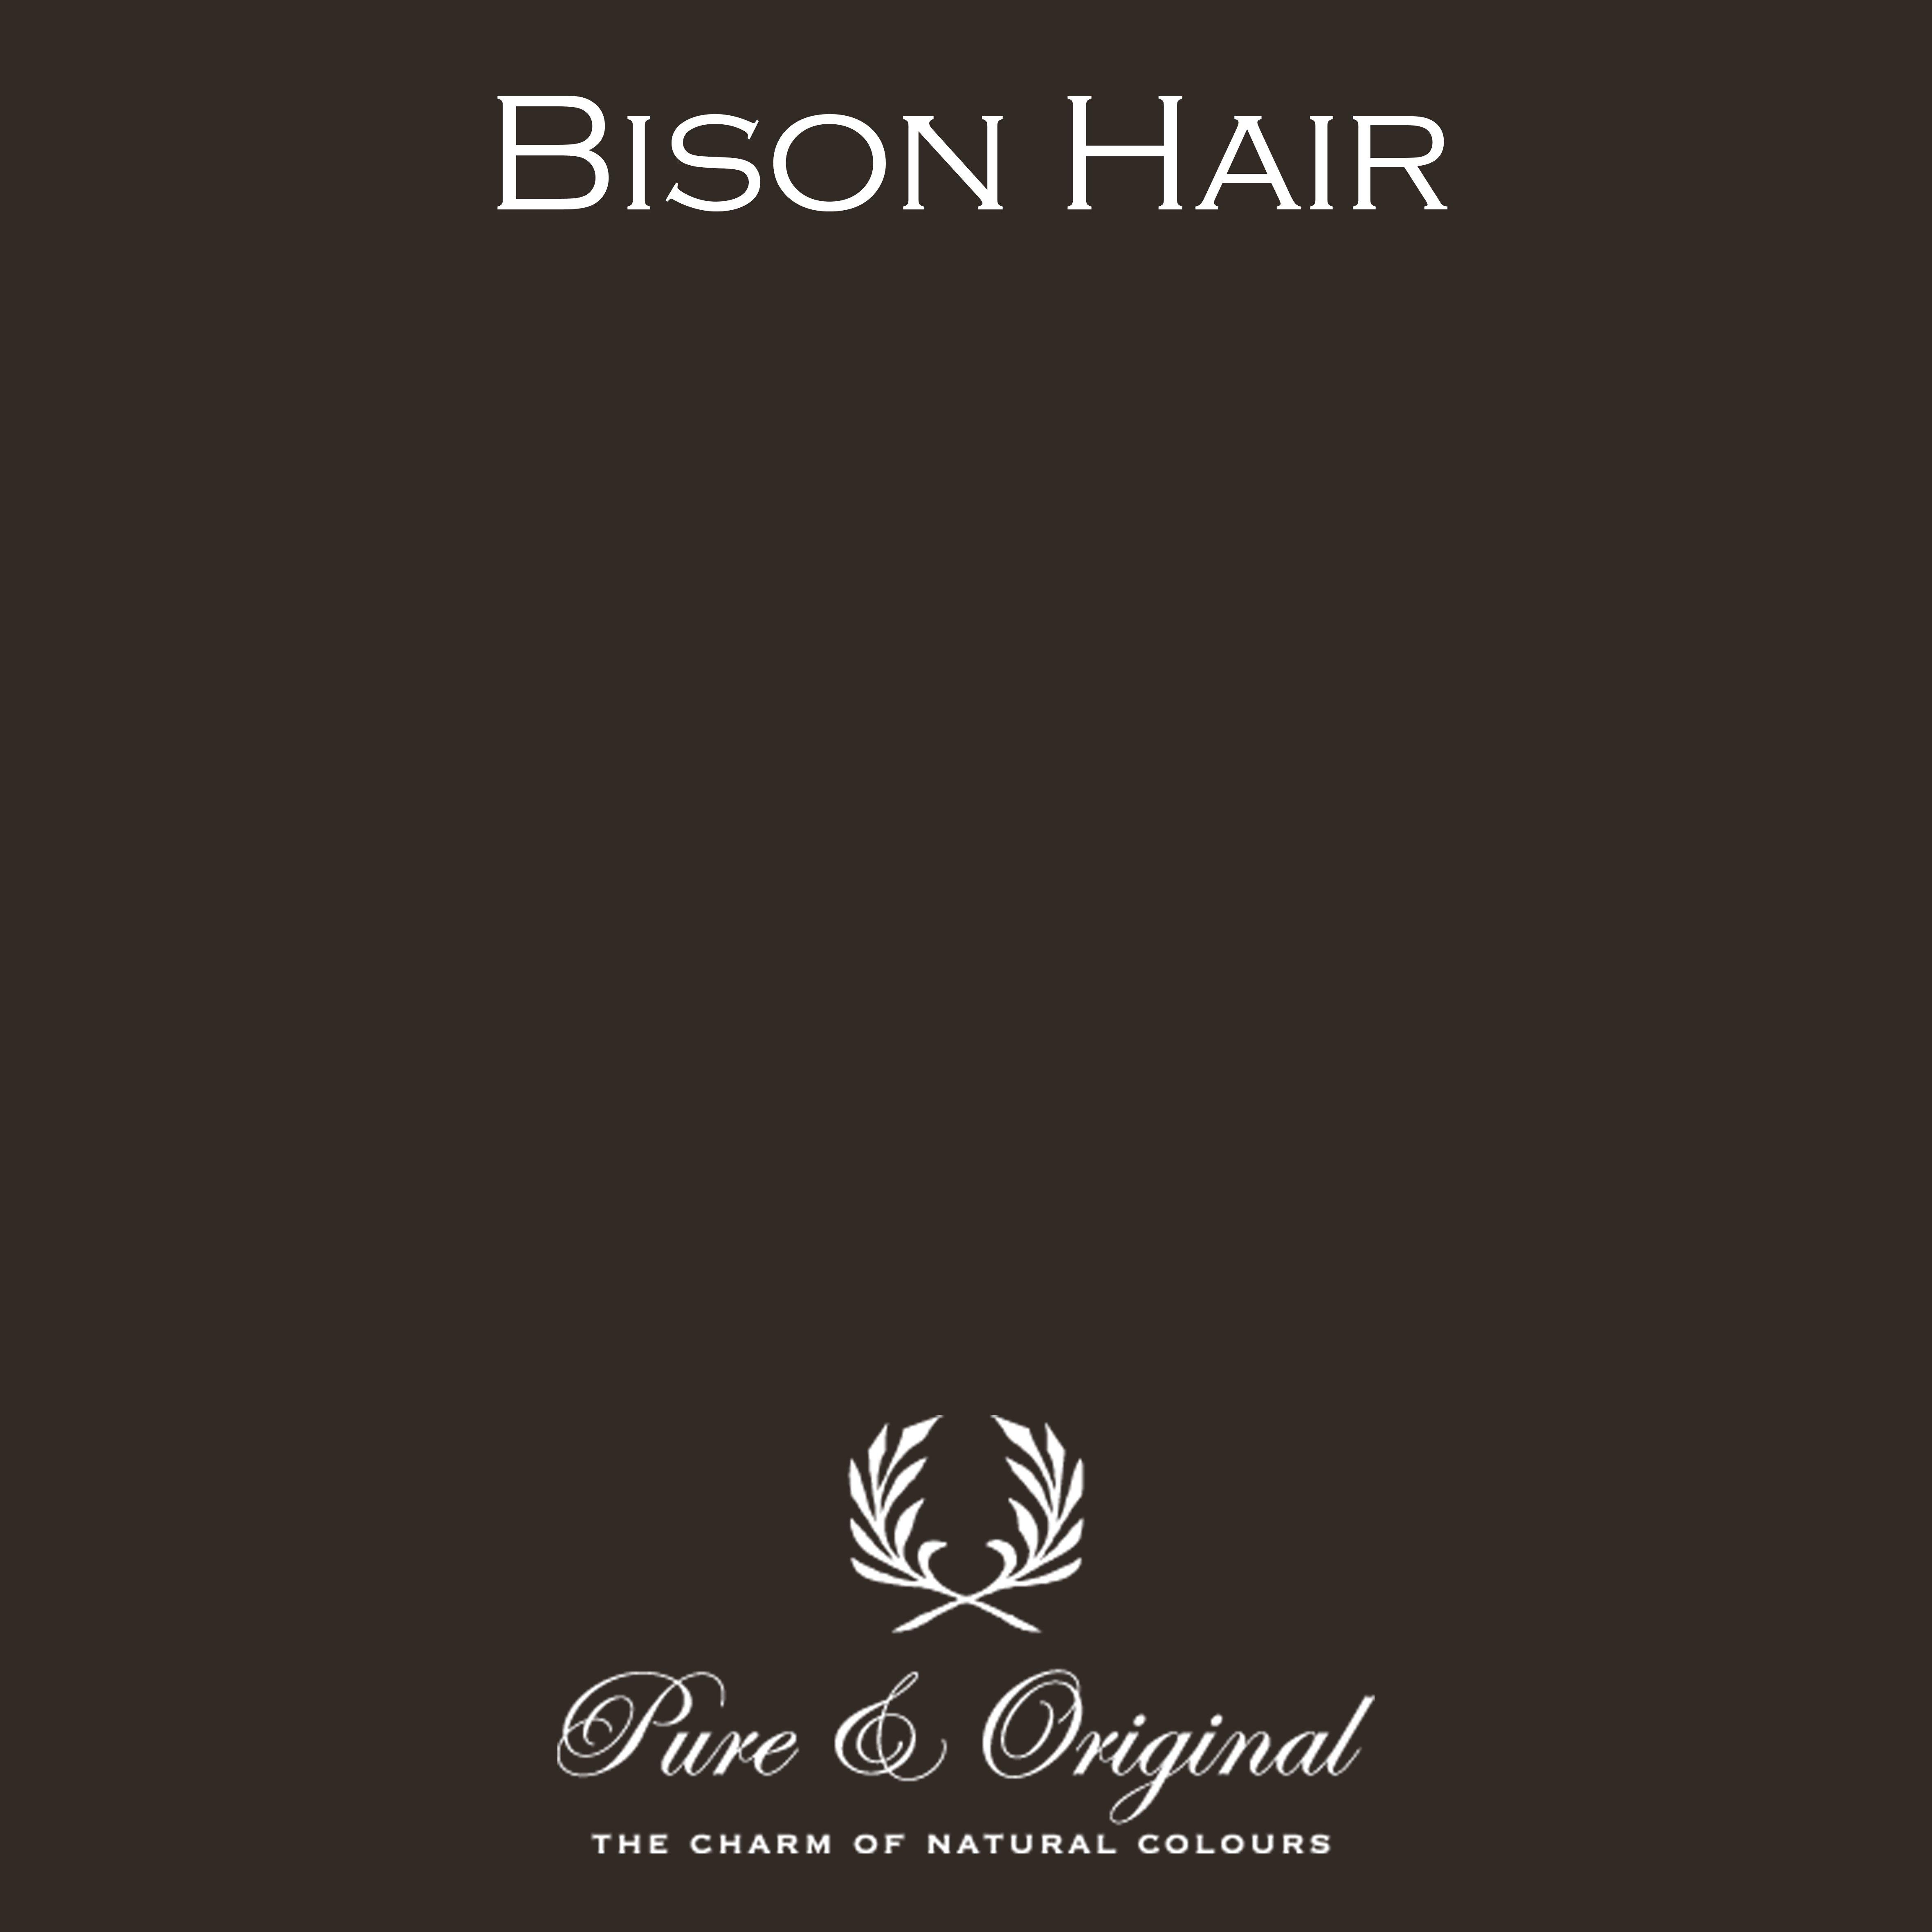 Bison Hair